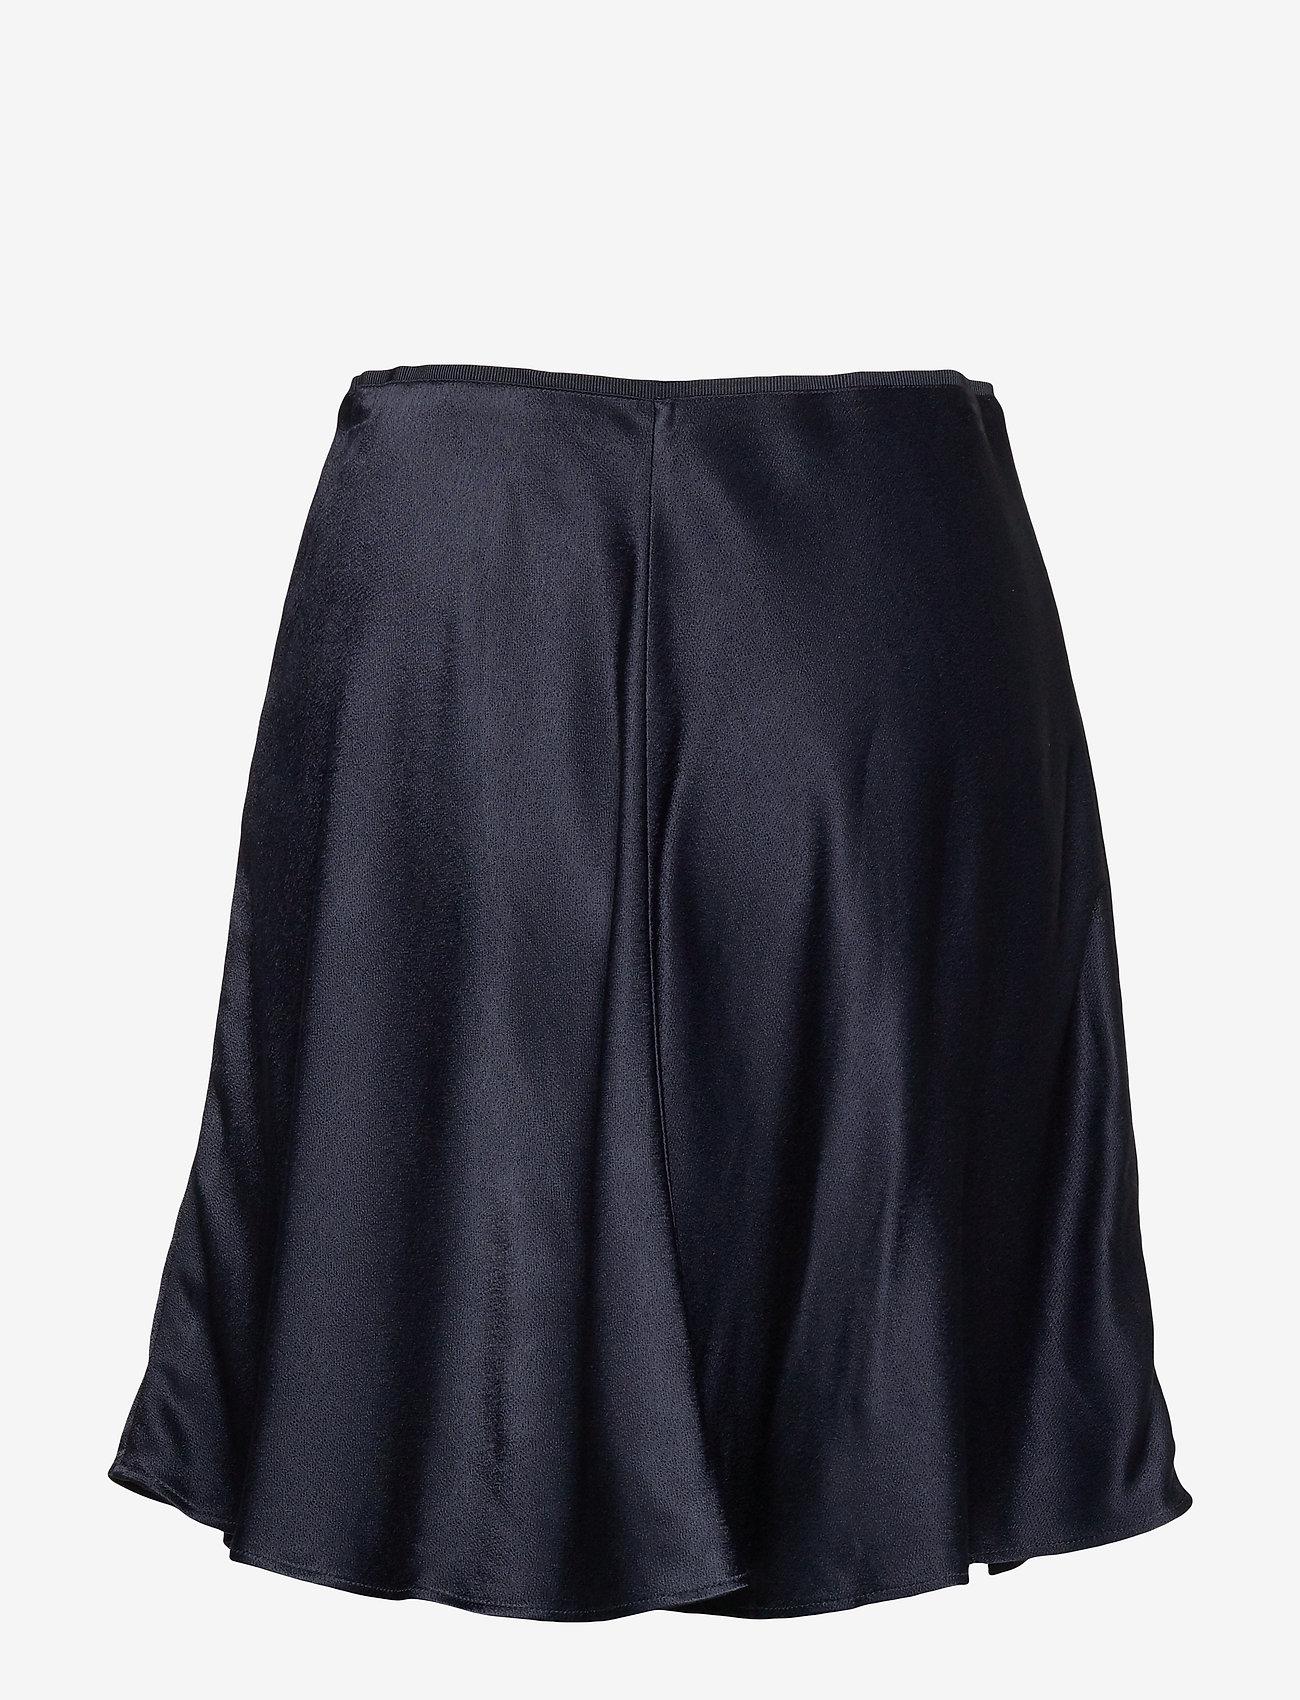 Samsøe Samsøe Alsop short skirt 10447 - Spódnice NIGHT SKY - Kobiety Odzież.